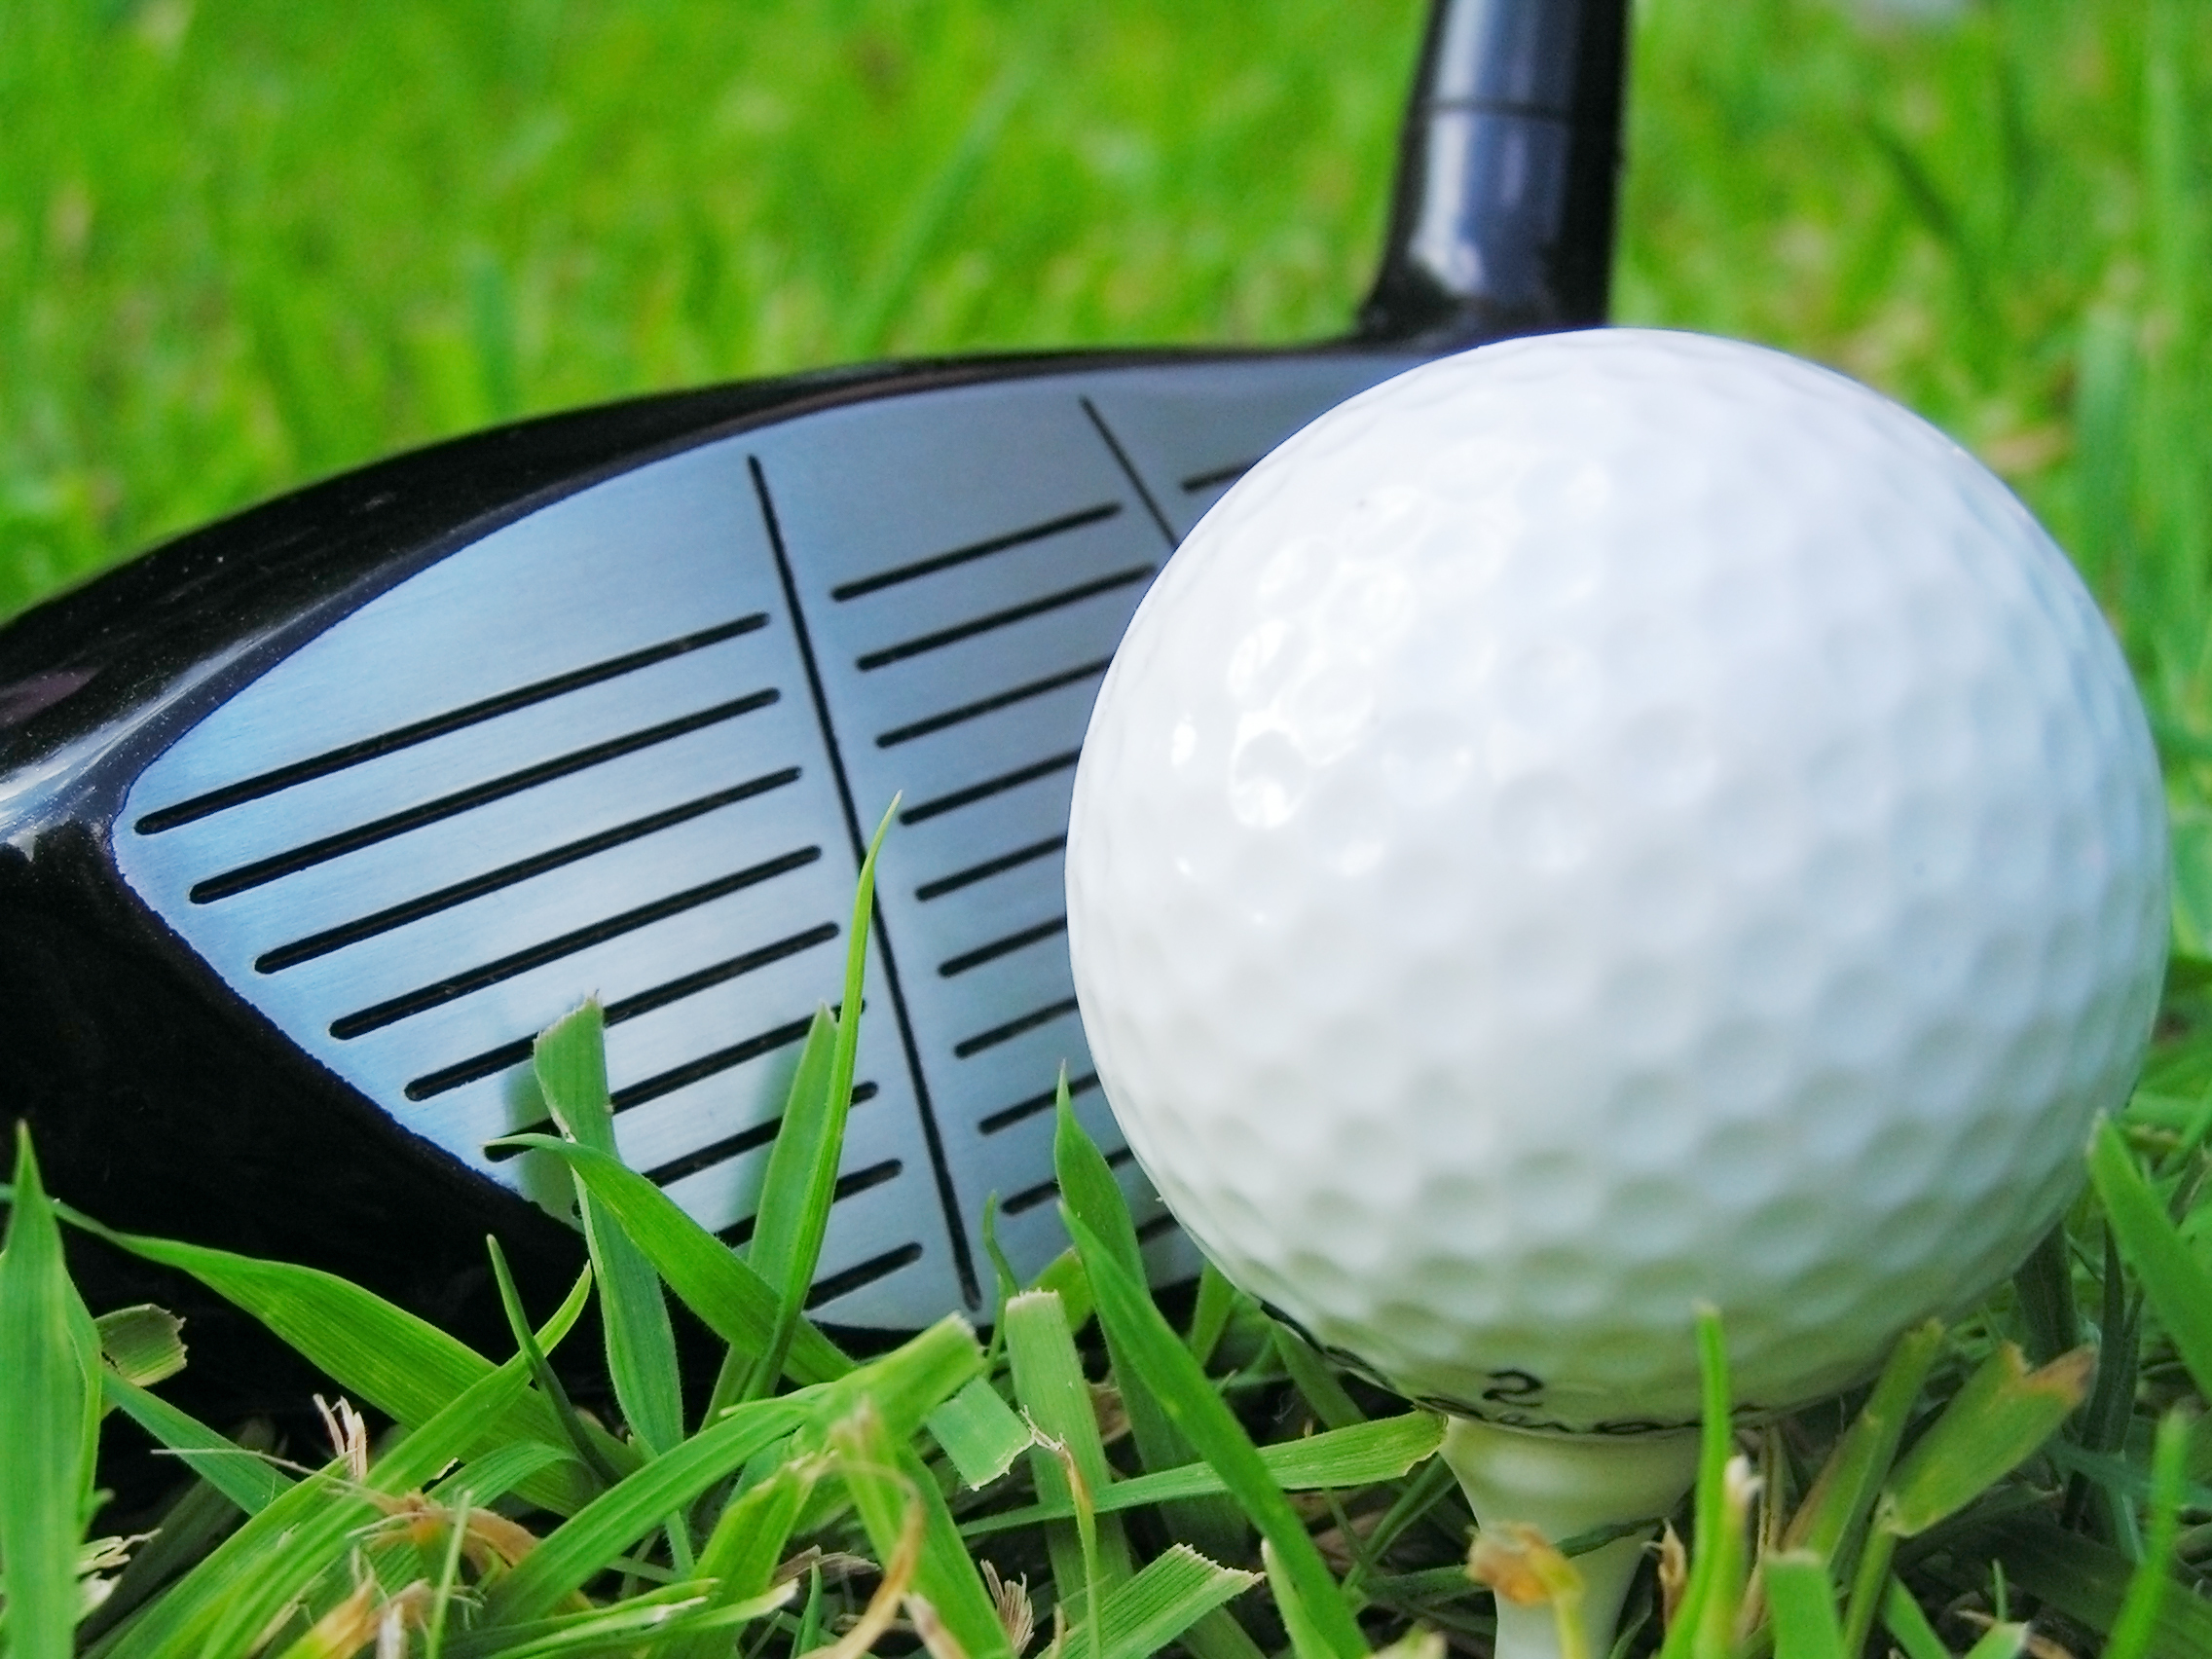 Go golfing on Lantana real estate.